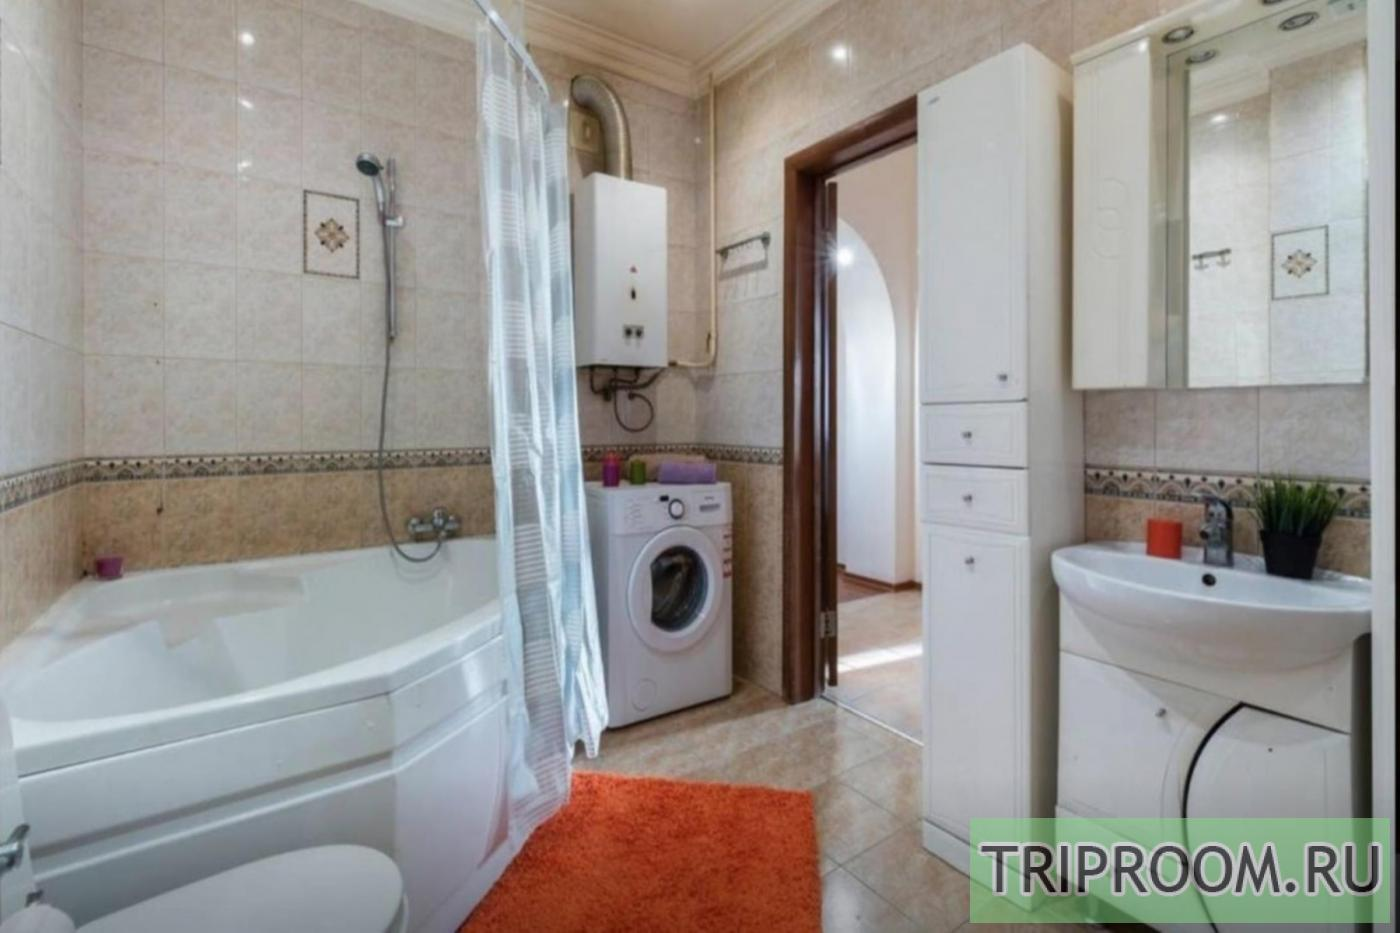 1-комнатная квартира посуточно (вариант № 33441), ул. проспект Соколова, фото № 7